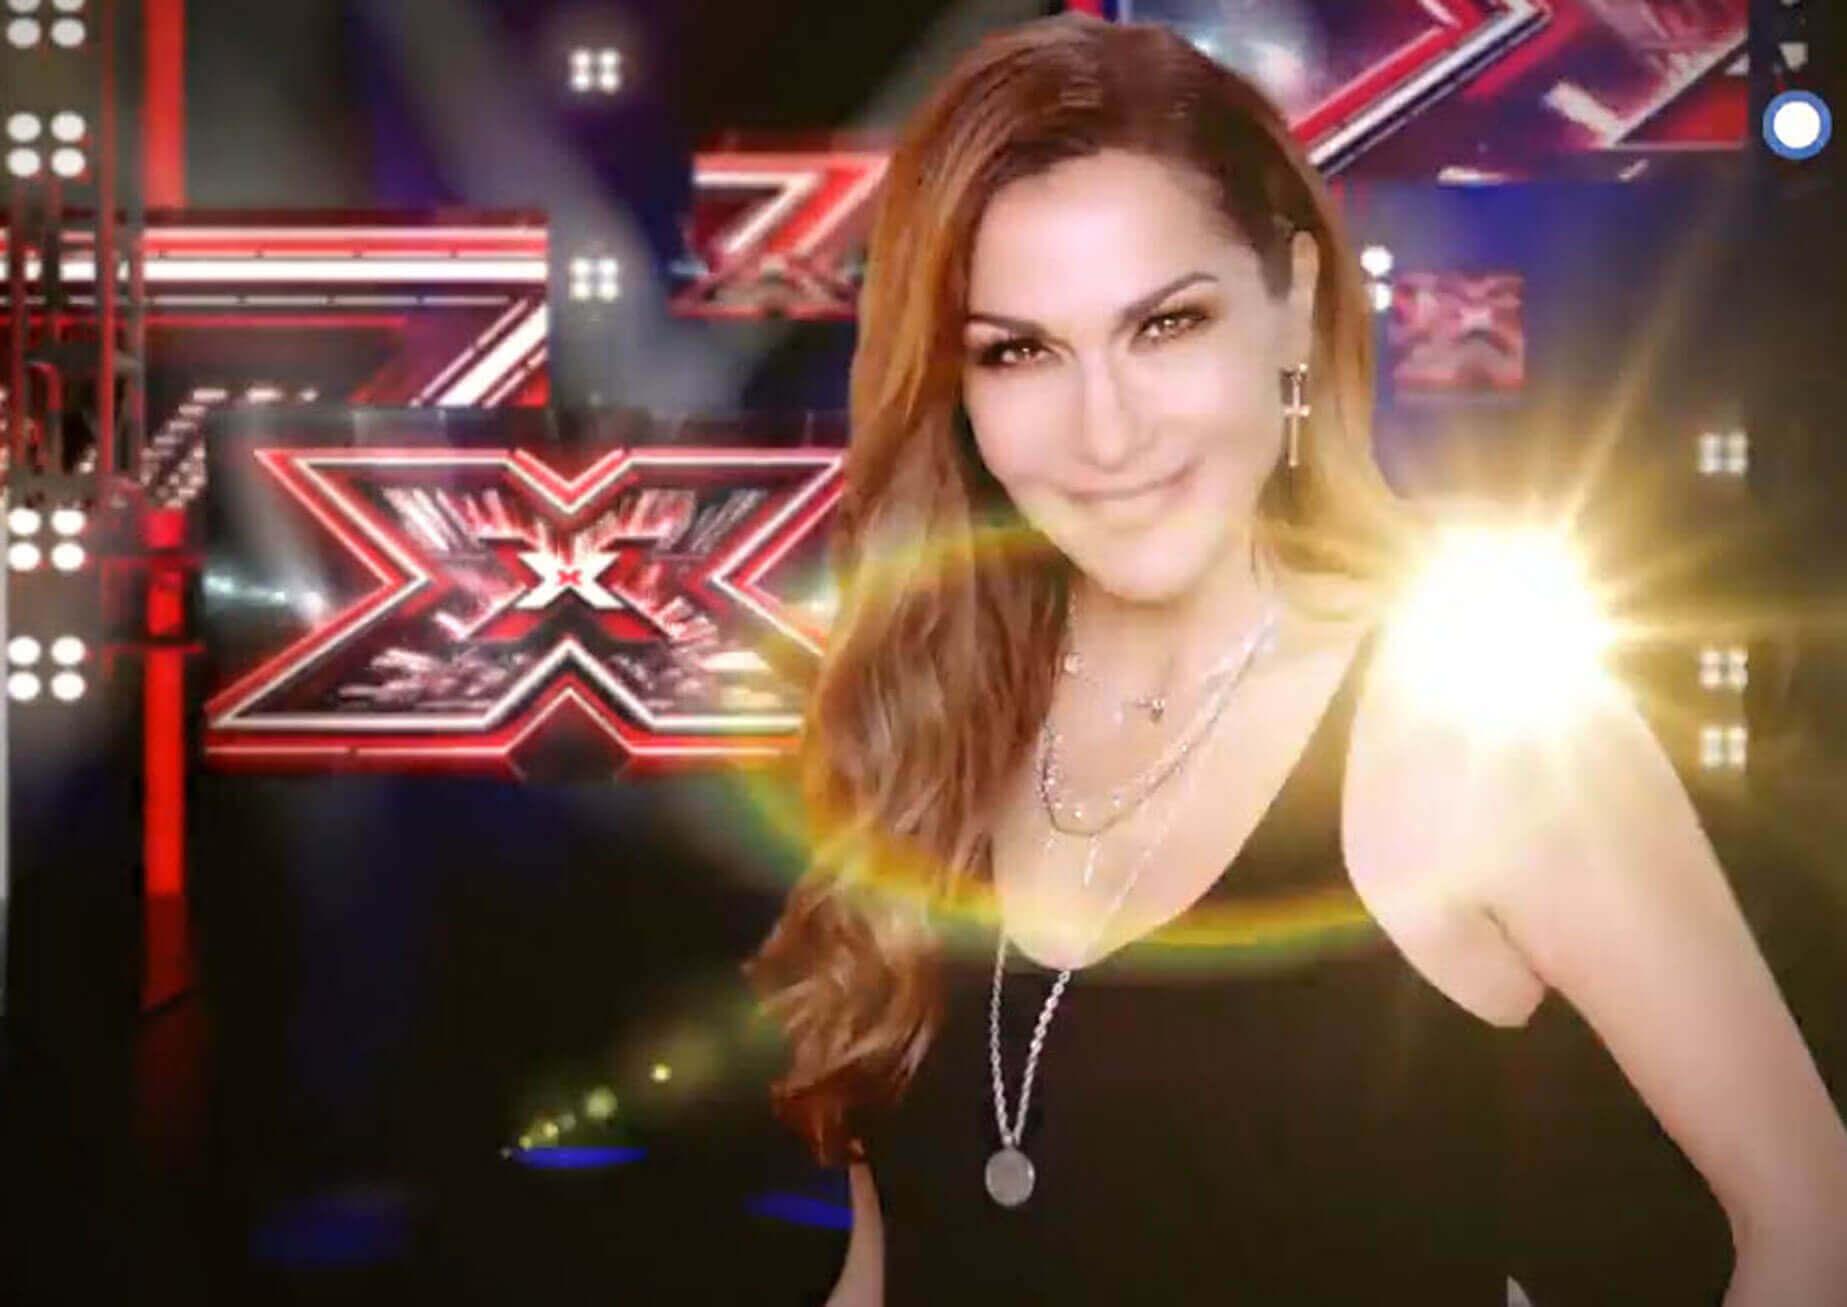 X Factor: η προετοιμασία, το «νέο αίμα» και η μάχη για τις ομάδες | Newsit.gr